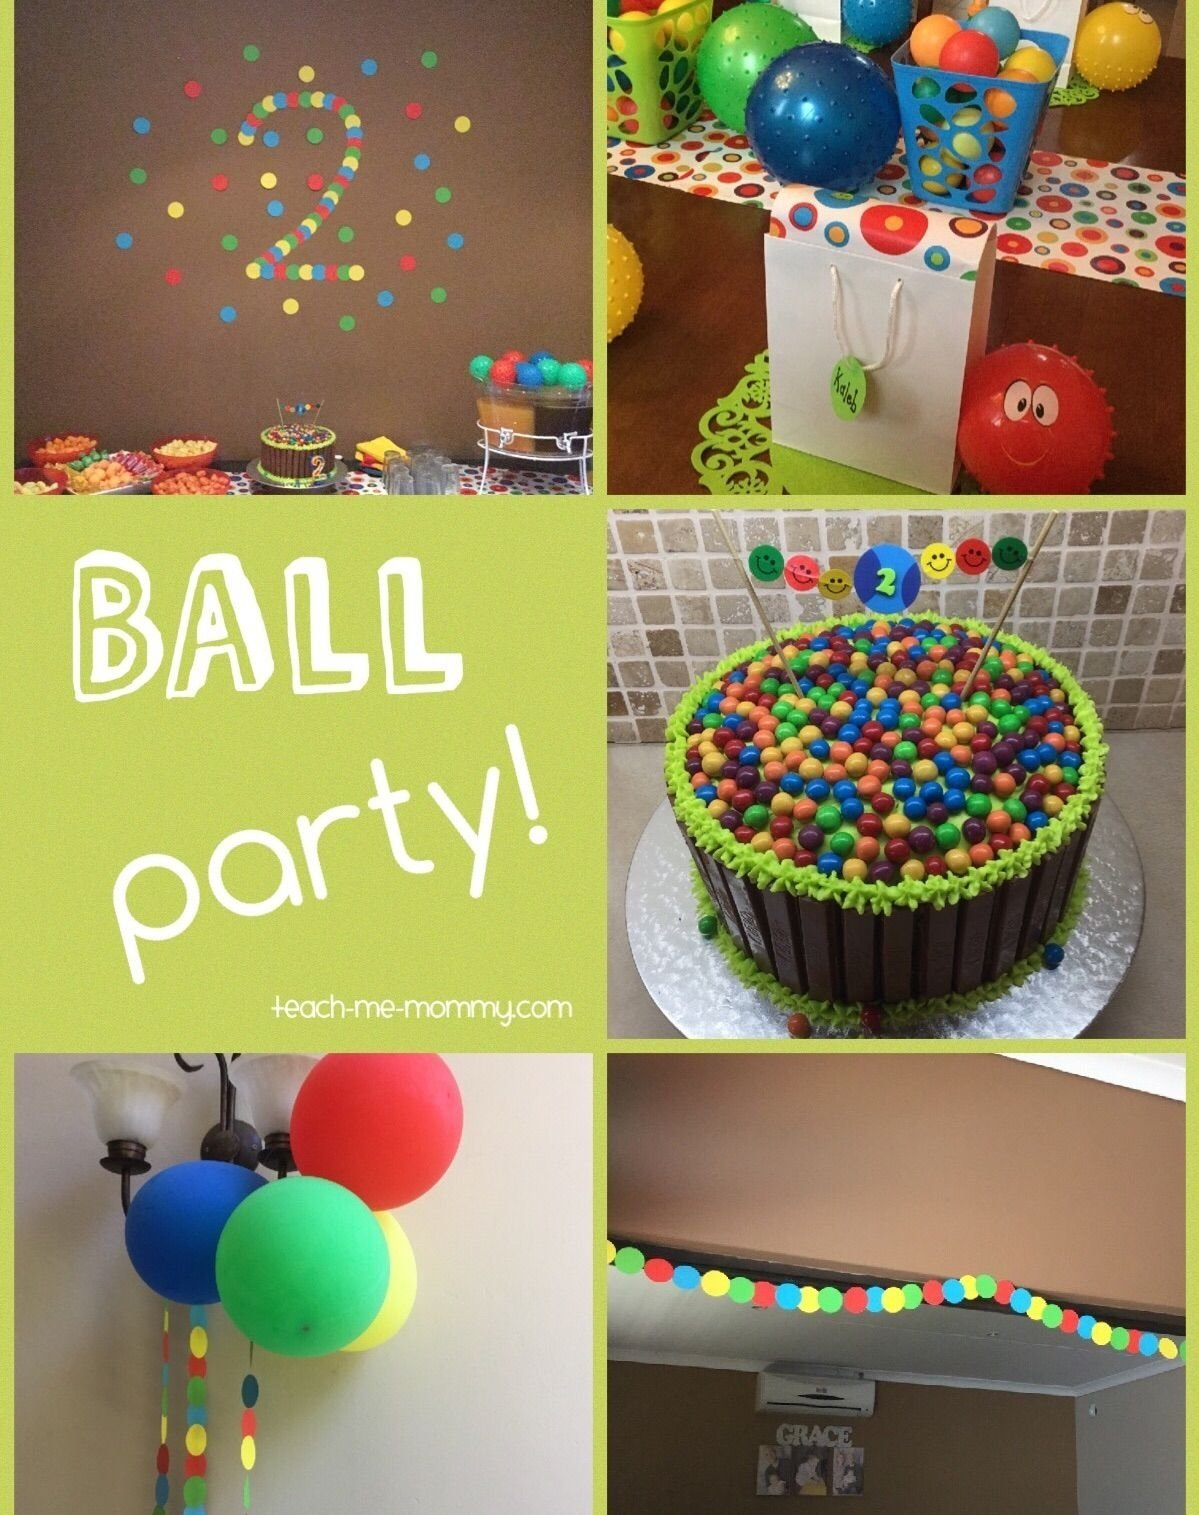 10 Trendy 4 Year Old Birthday Ideas ball themed party for a 2 year old themed parties birthdays and 12 2020